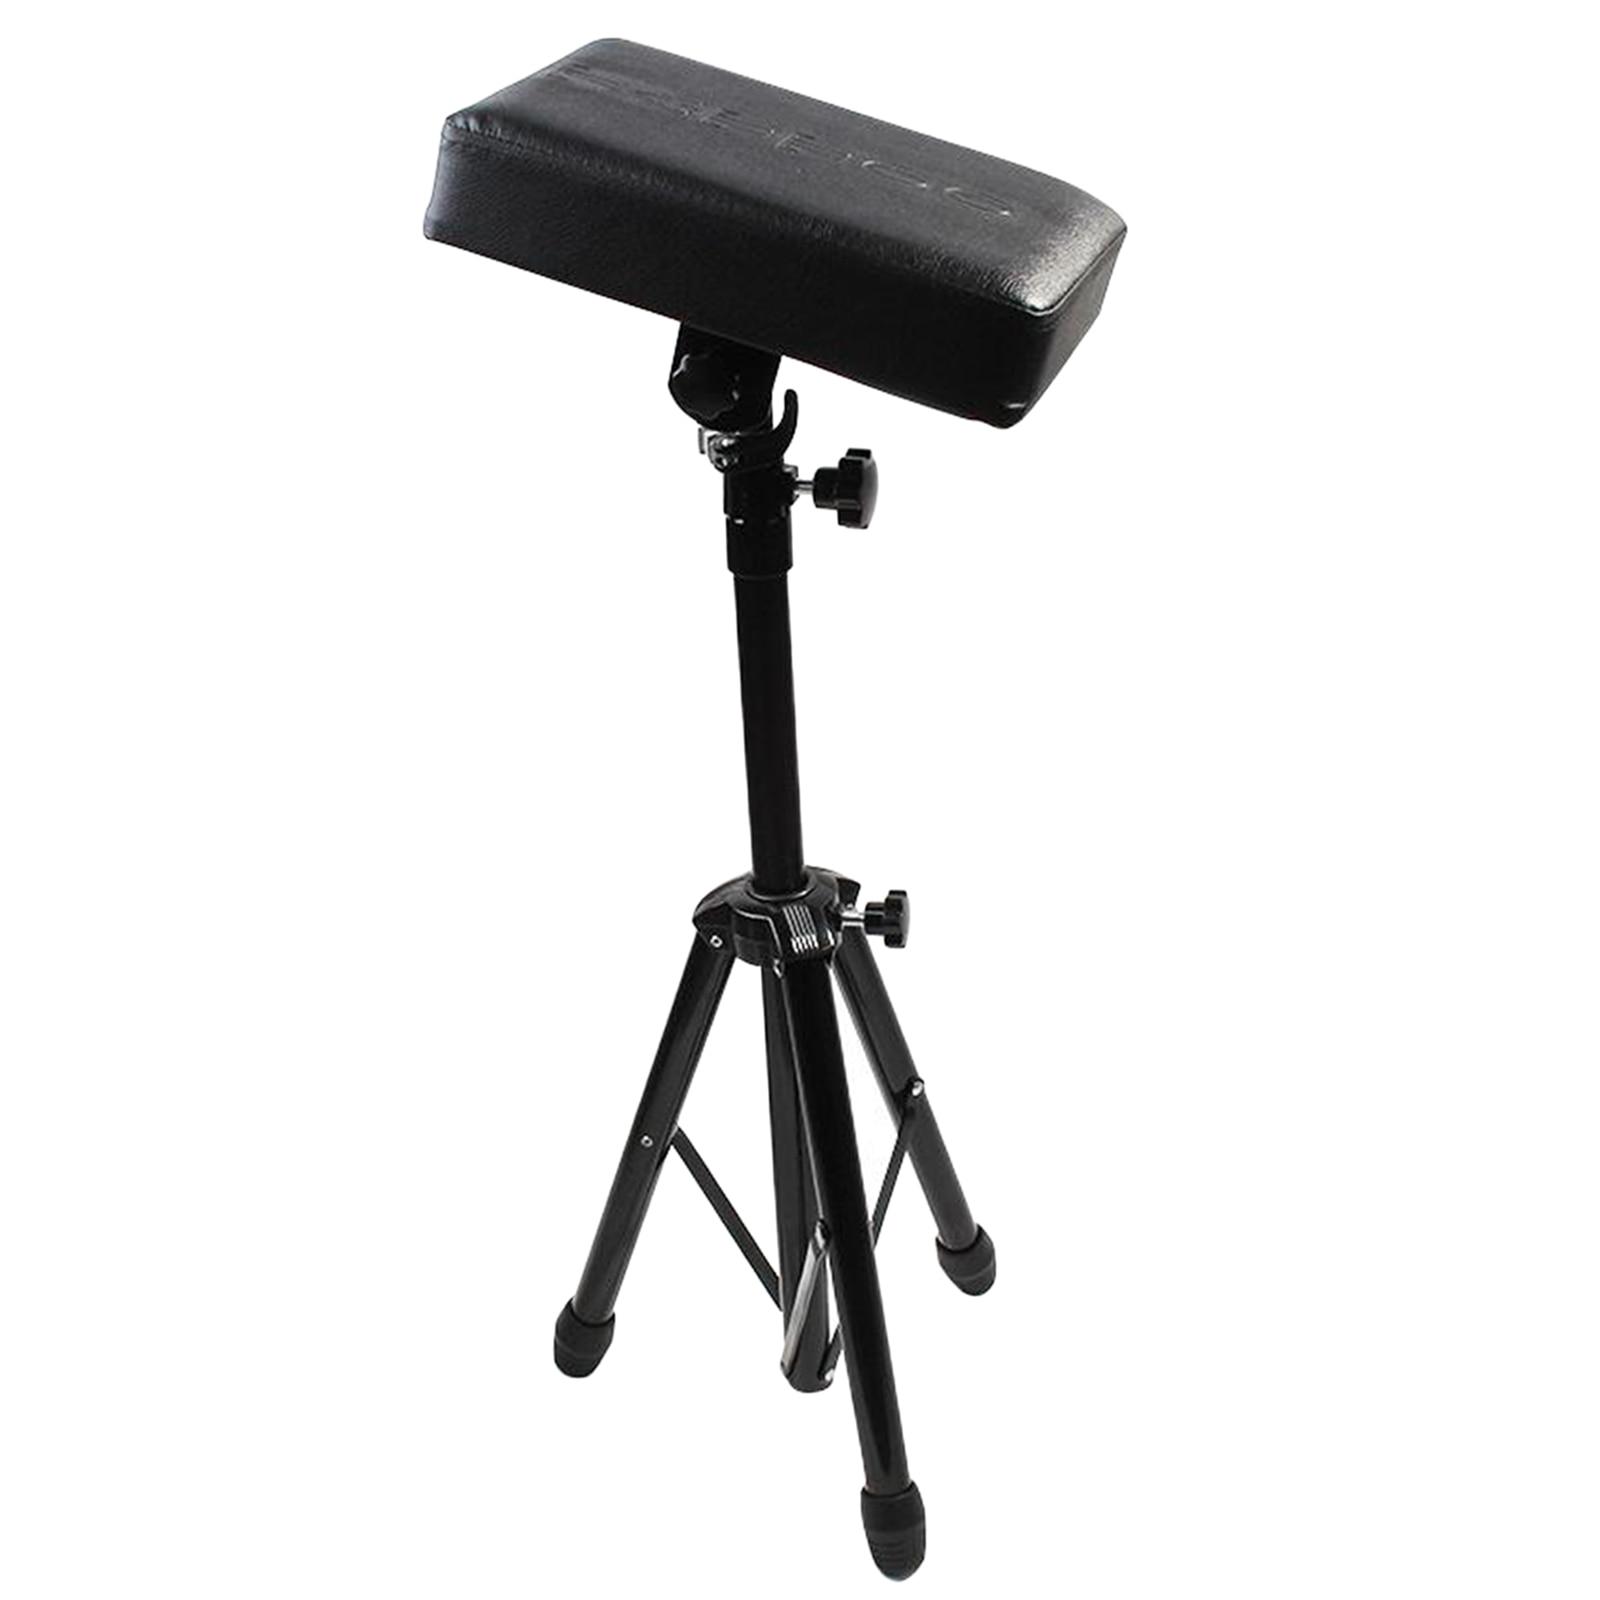 Tattoo Armrest, Tattoo Arm Leg Rest Stand Tripod w/ Adjustable Height for Tattoo Supply Stand Studio Chair Stand